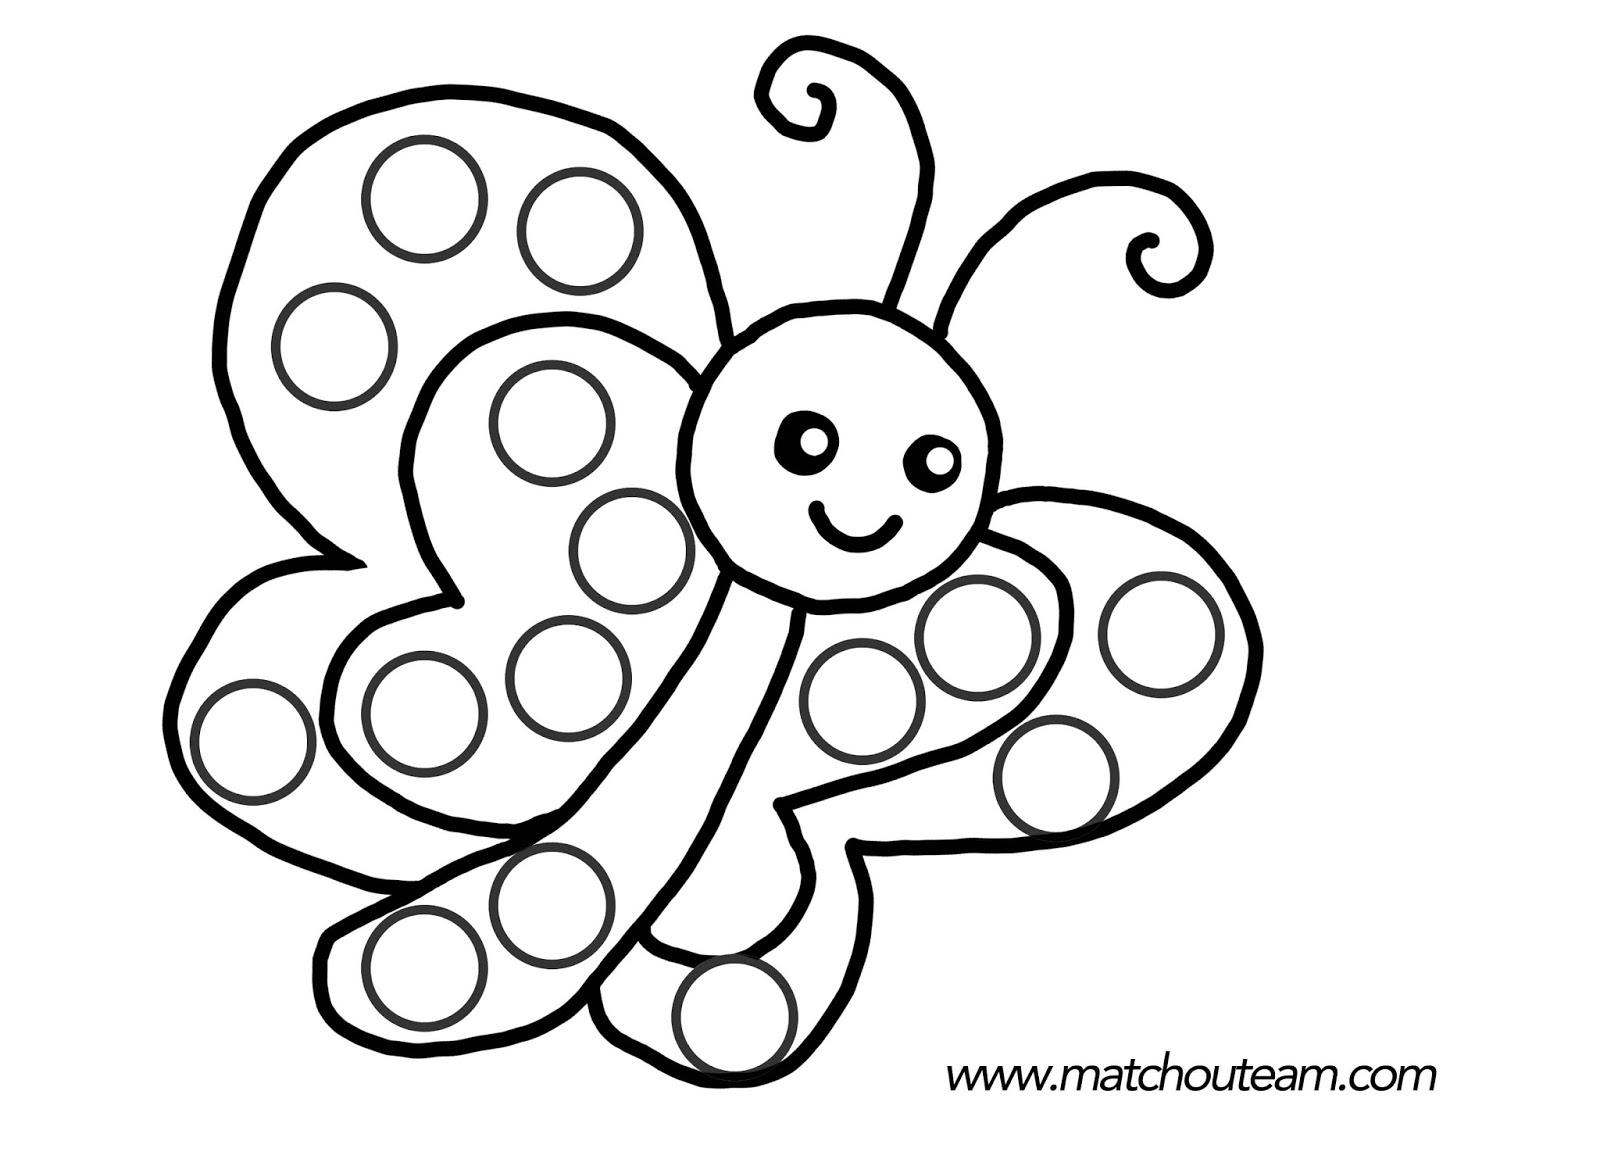 96 dessins de coloriage insectes rigolos imprimer - Dessin coccinelle facile ...